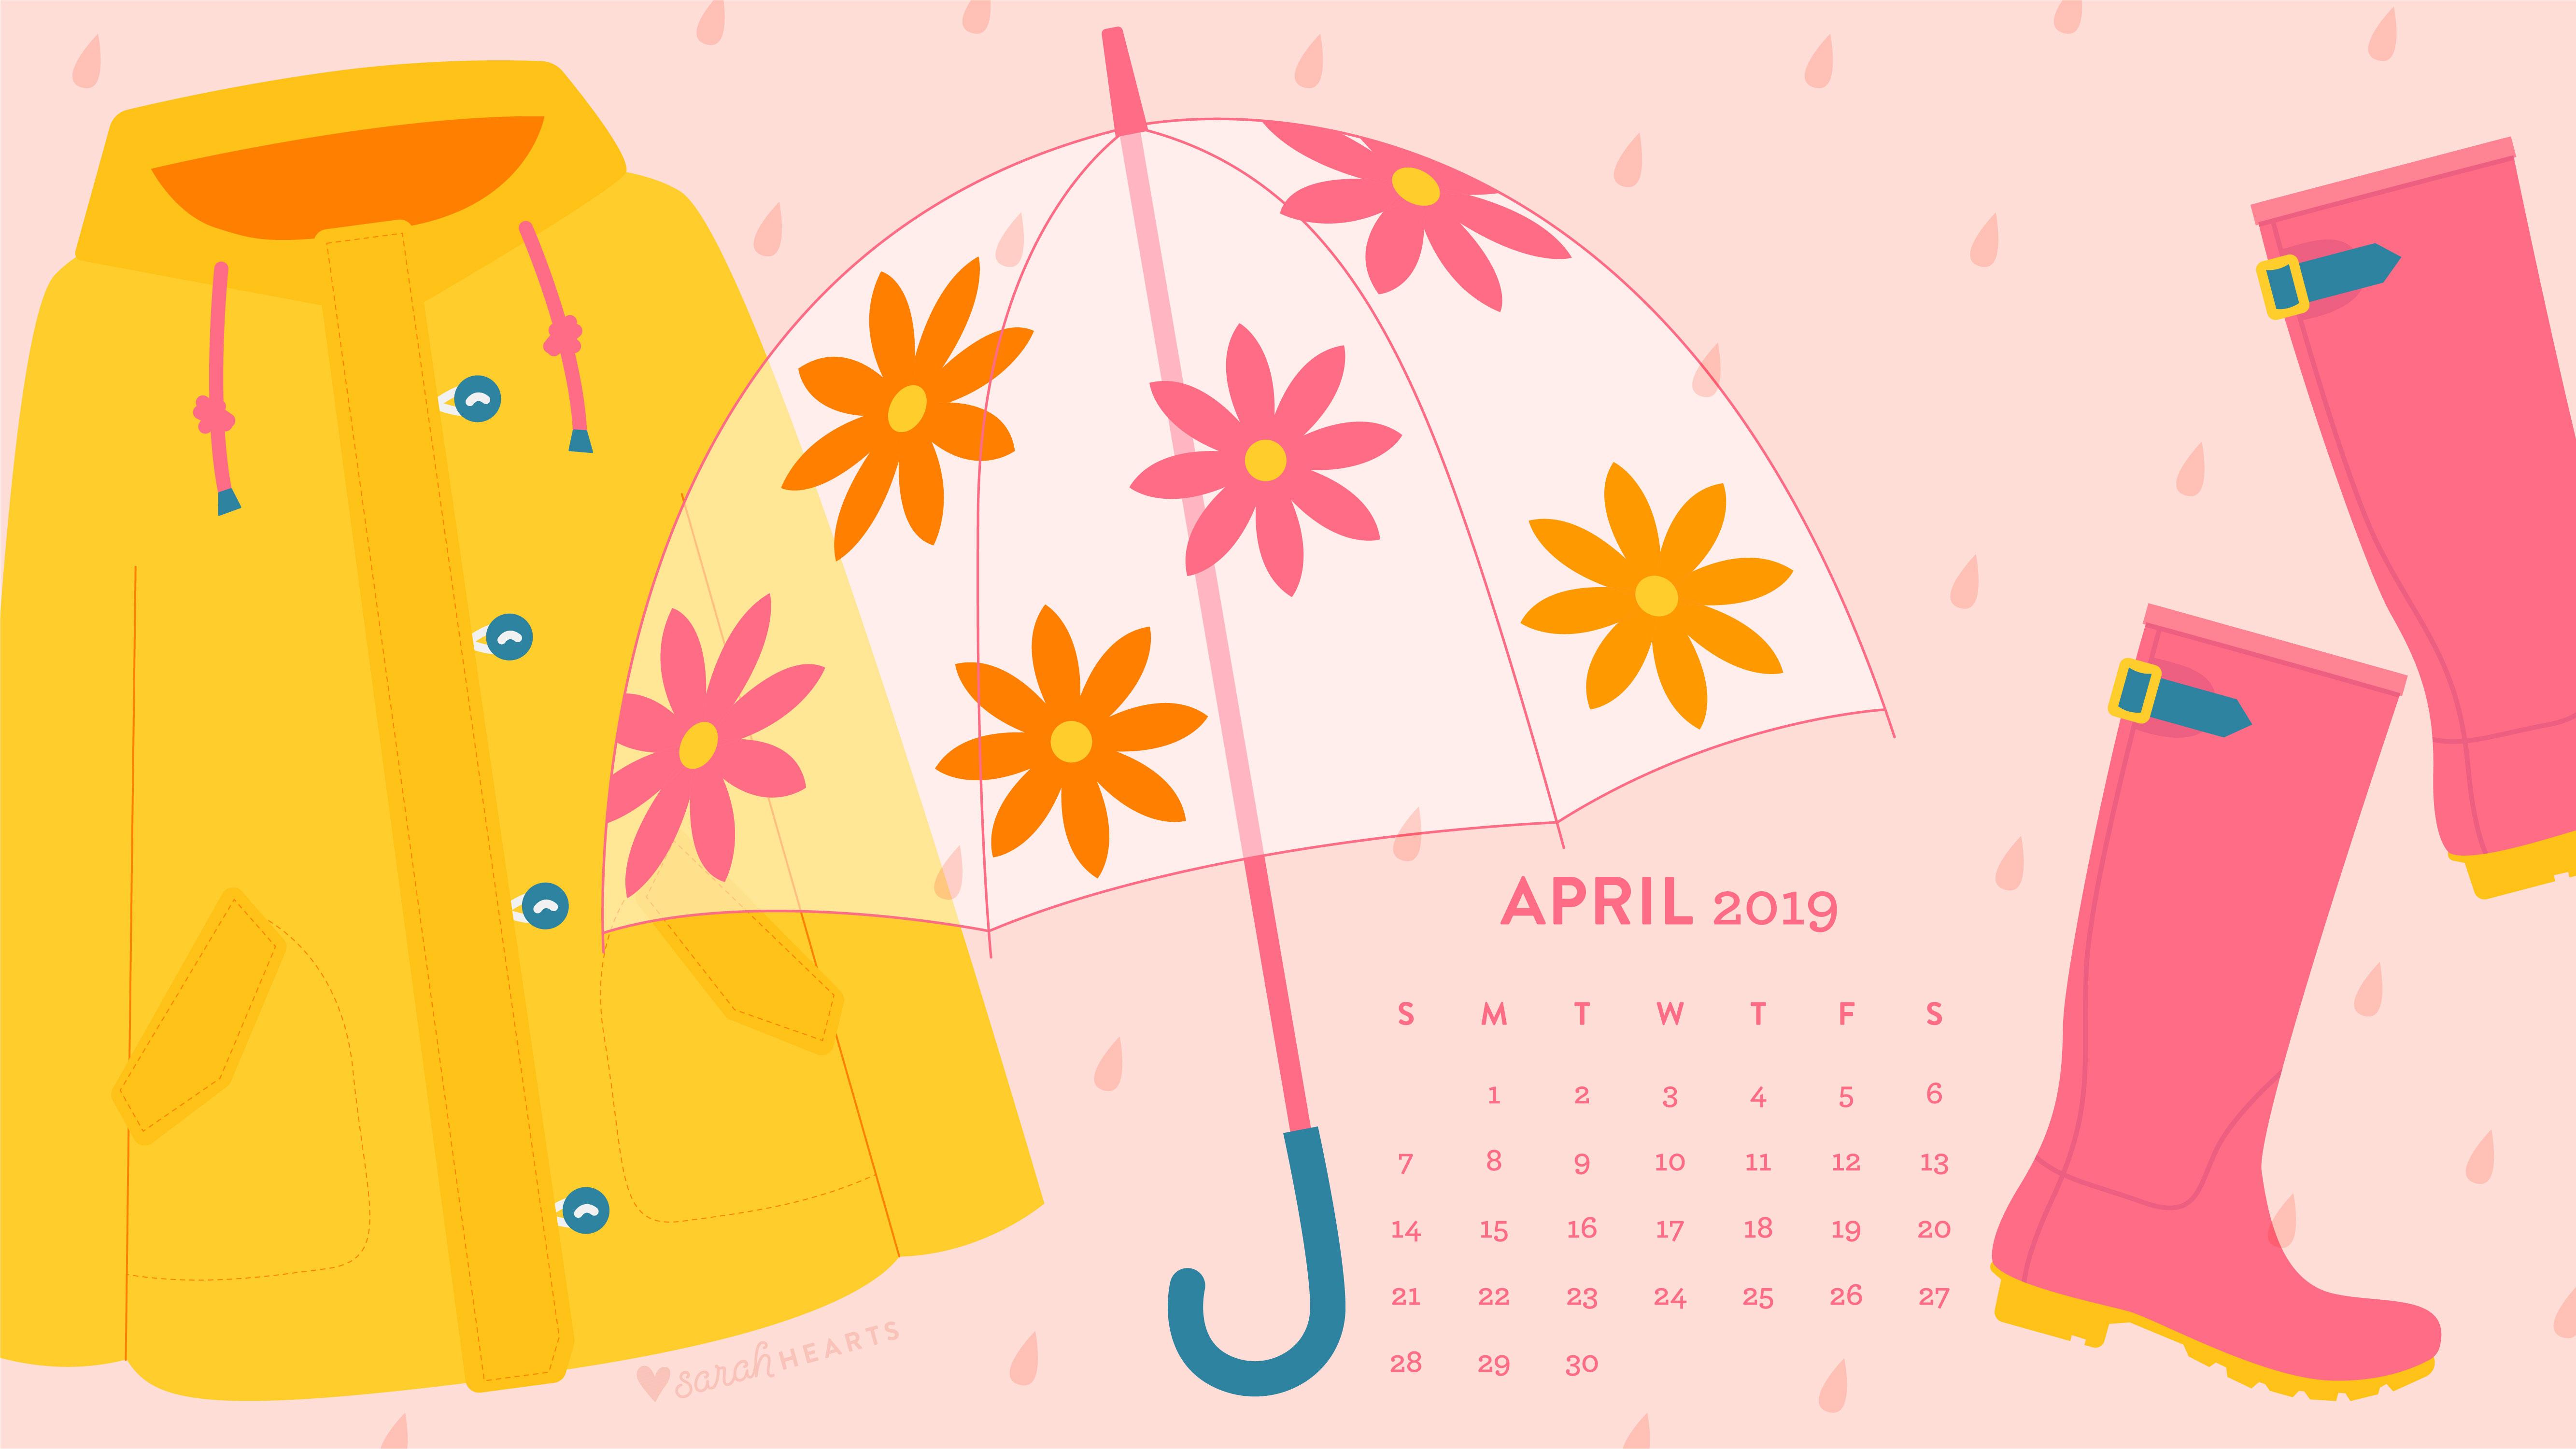 April 2019 Calendar Wallpaper Sarah Hearts